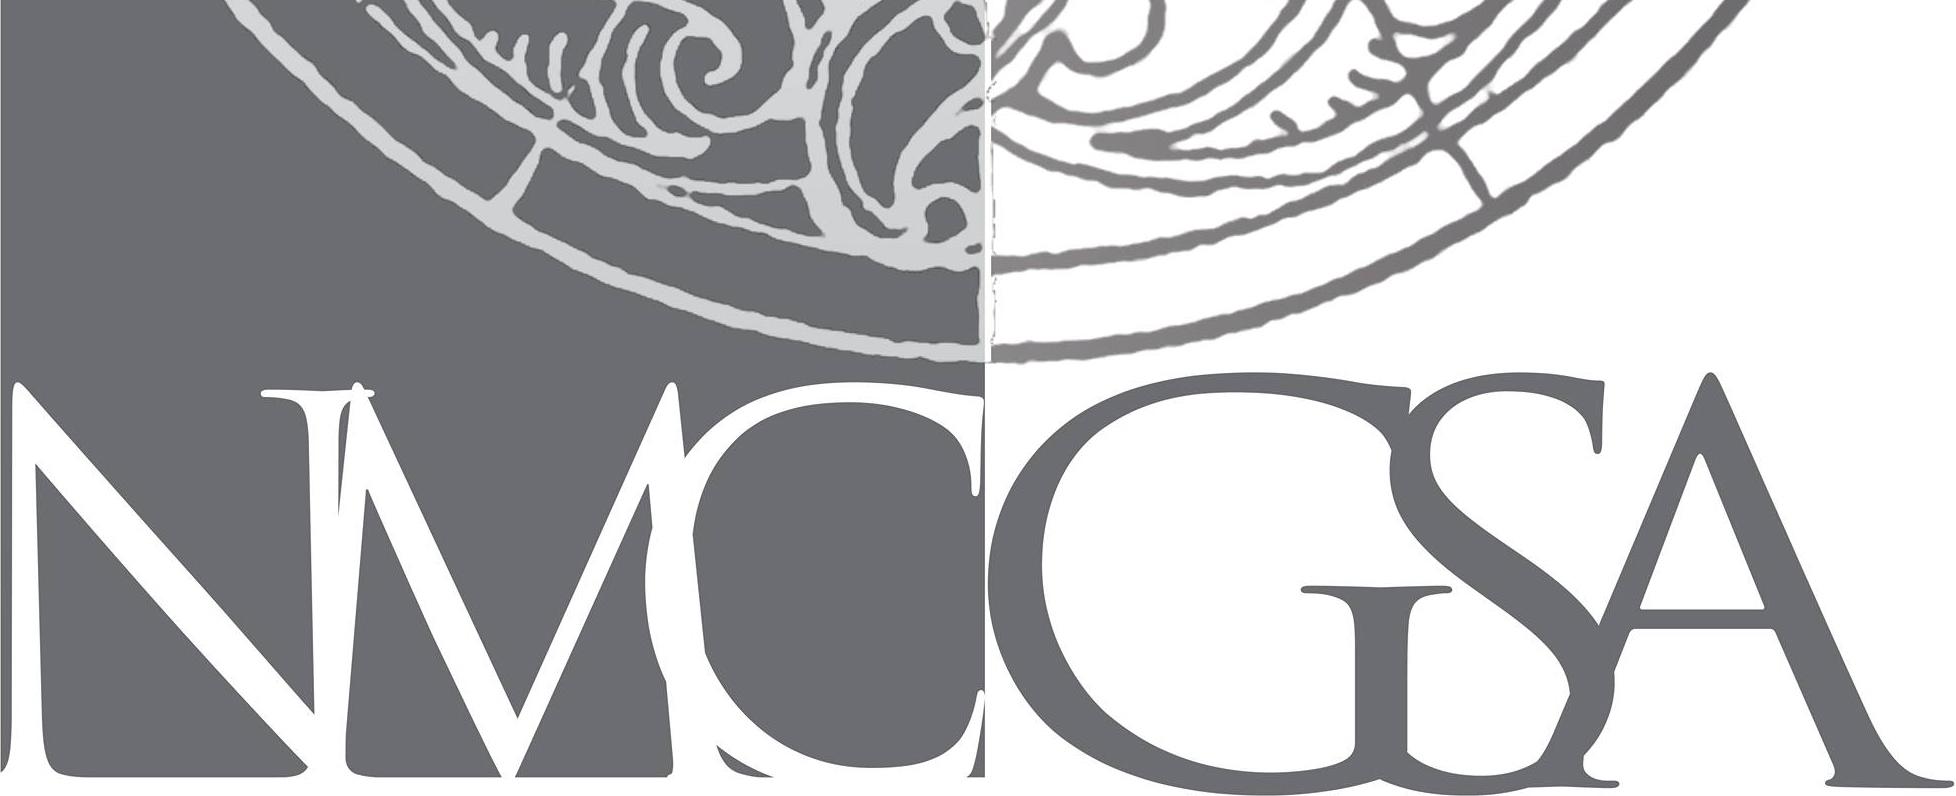 NMC Graduate Students' Association logo